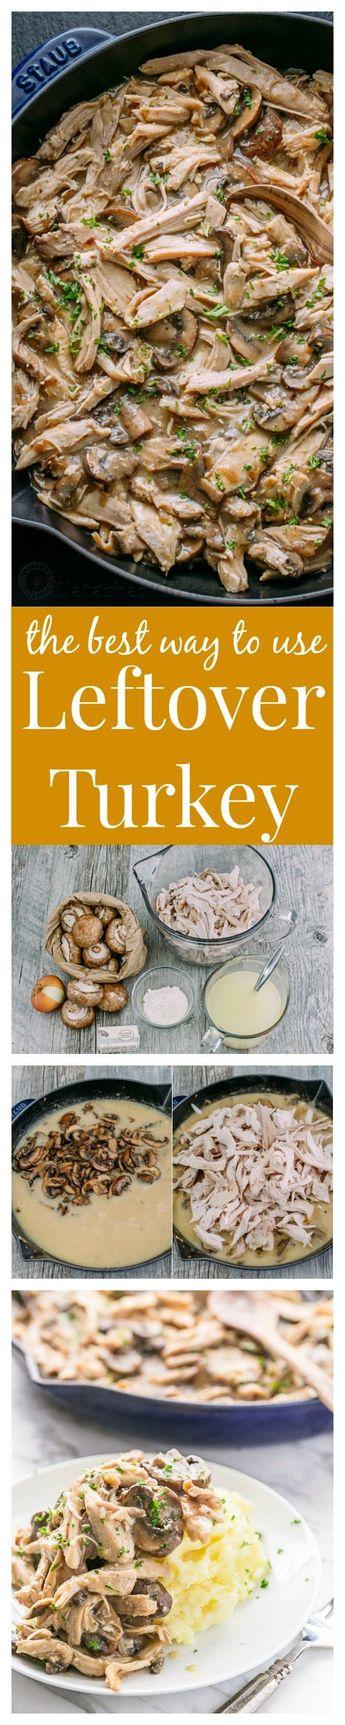 Leftover Turkey in Creamy Mushroom Sauce - NatashasKitchen.com